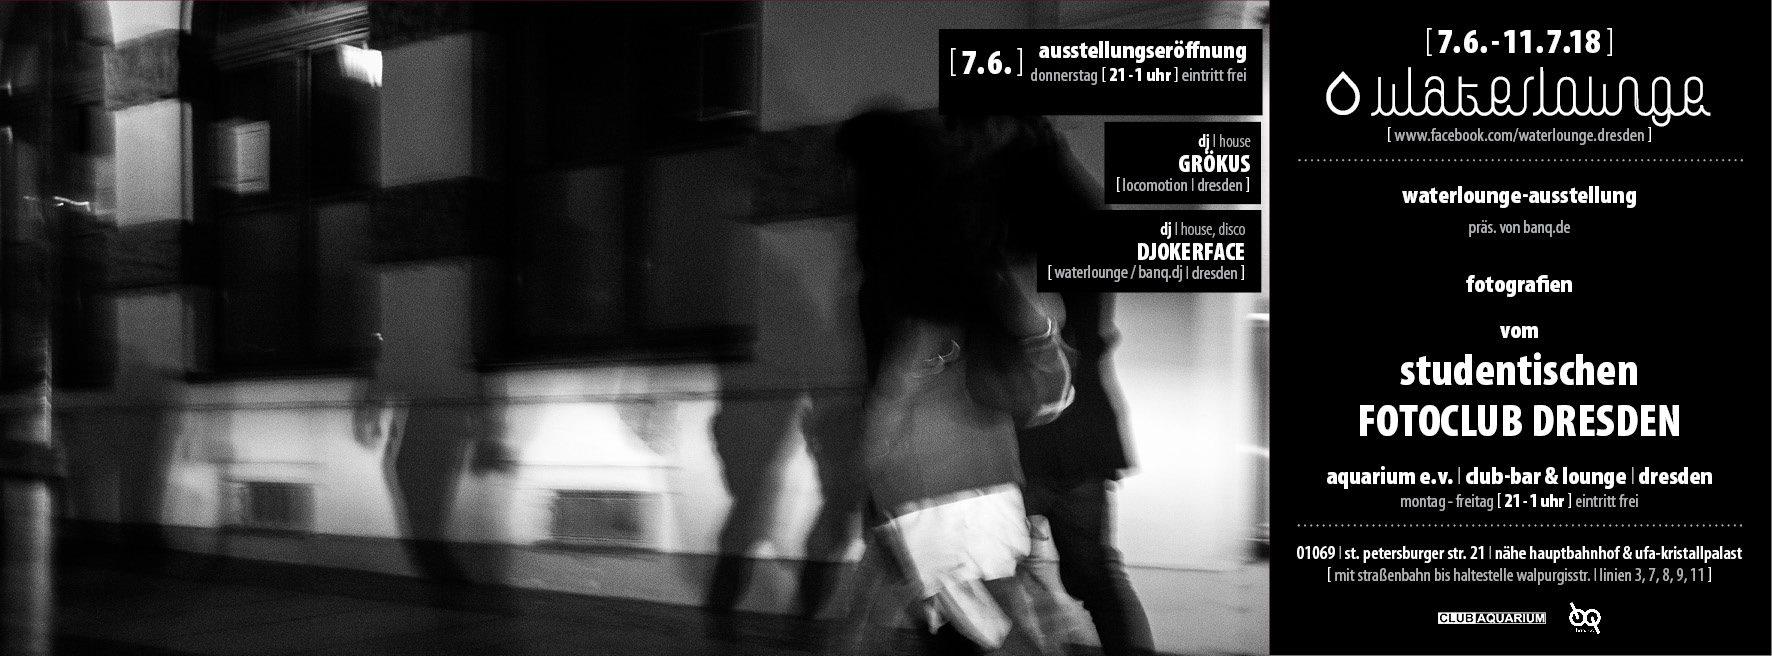 Waterlounge – Fotoclub Dresden